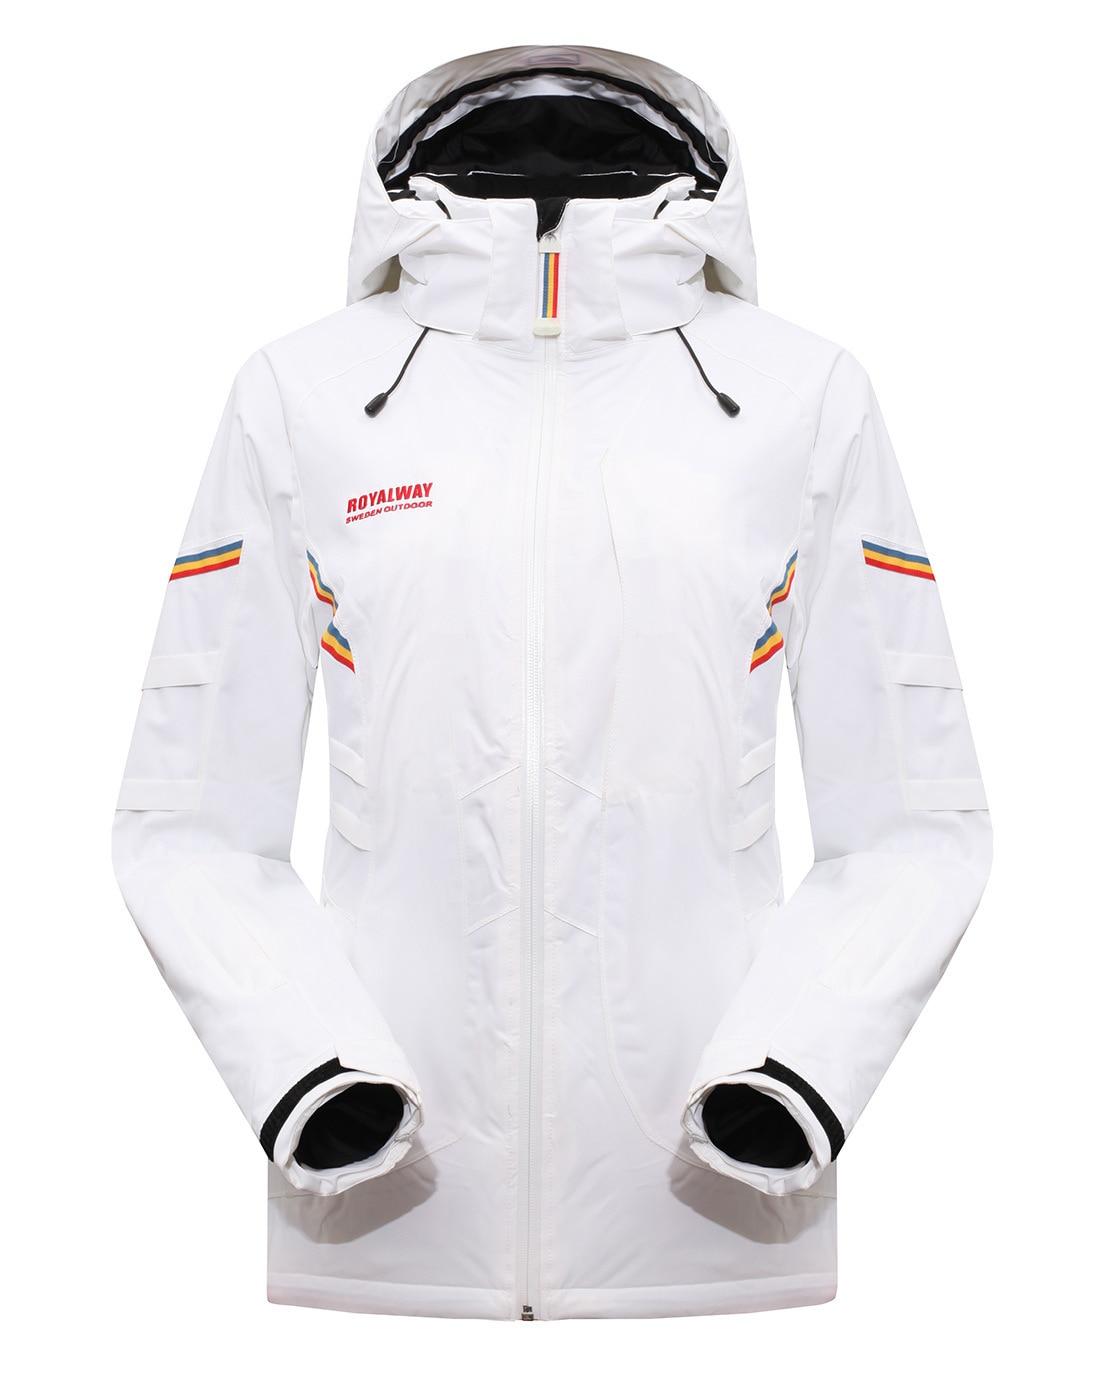 ROYALWAY Women Skiing Ski Jackets Windproof Waterproof Jacket Adjustable Removable Breathable Quality Recco GPSJacket#RFSL4504G